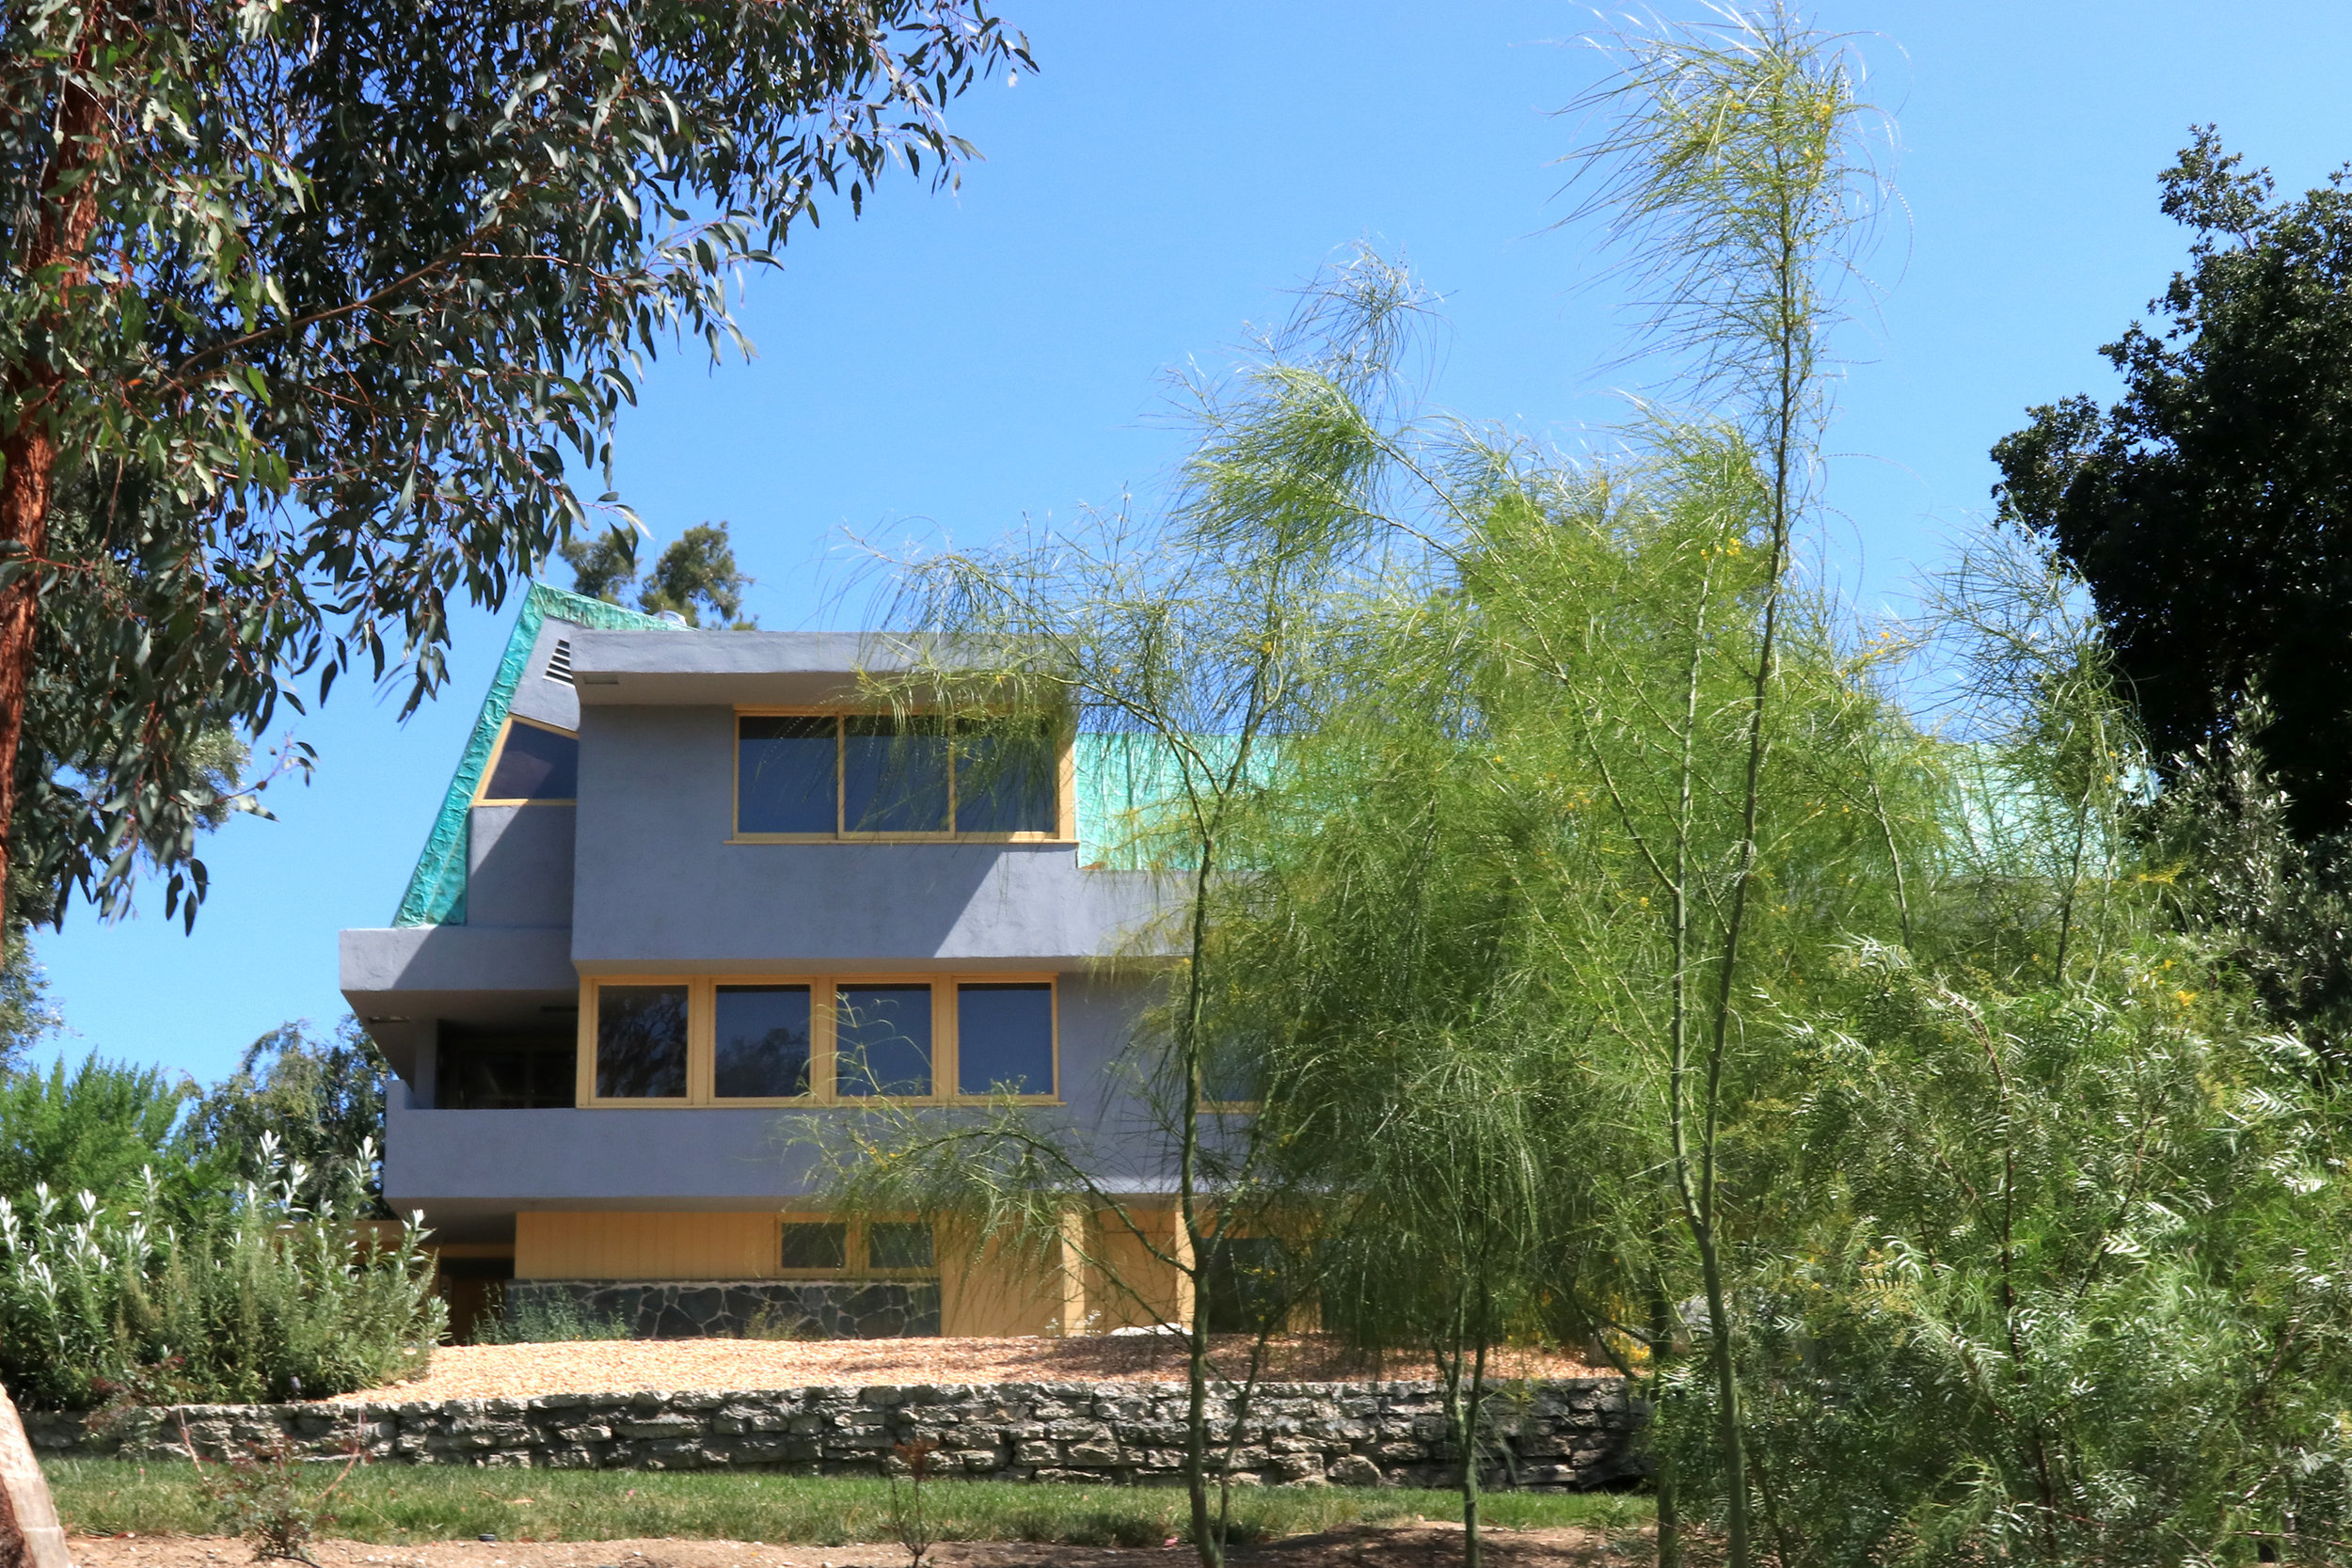 Van Dekker House - R.M. Schindler  1940  19950 W Collier St.